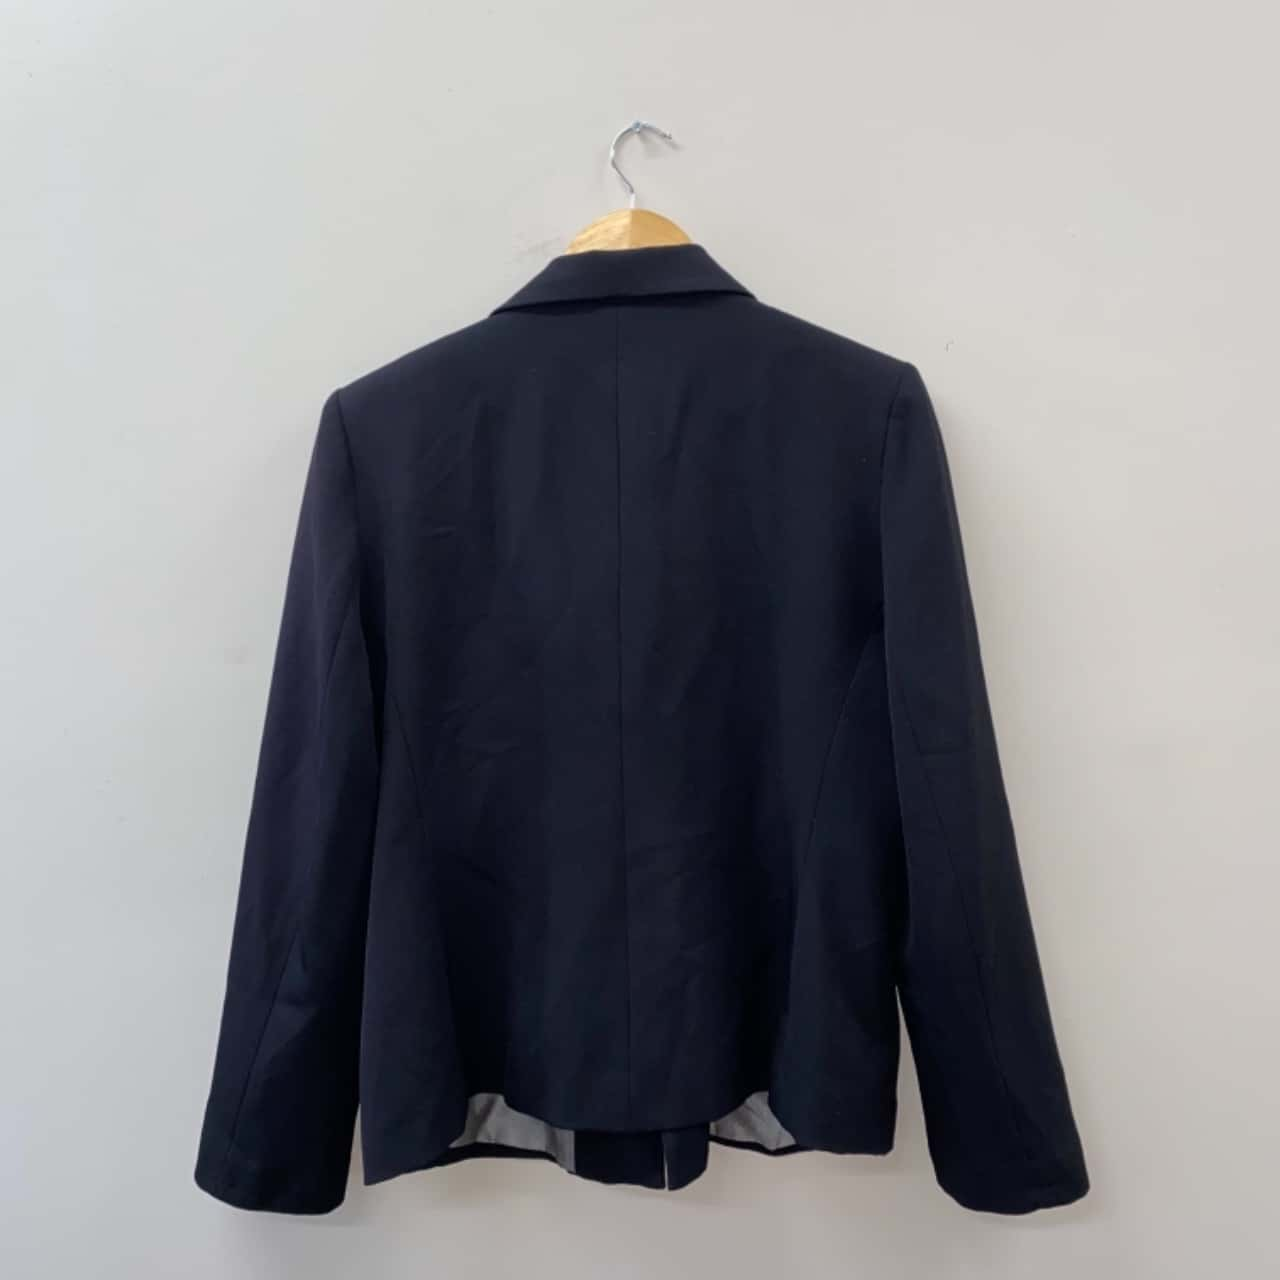 ** REDUCED LAST CHANCE ** Liz Jordan Women's Size 14 Black Blazer